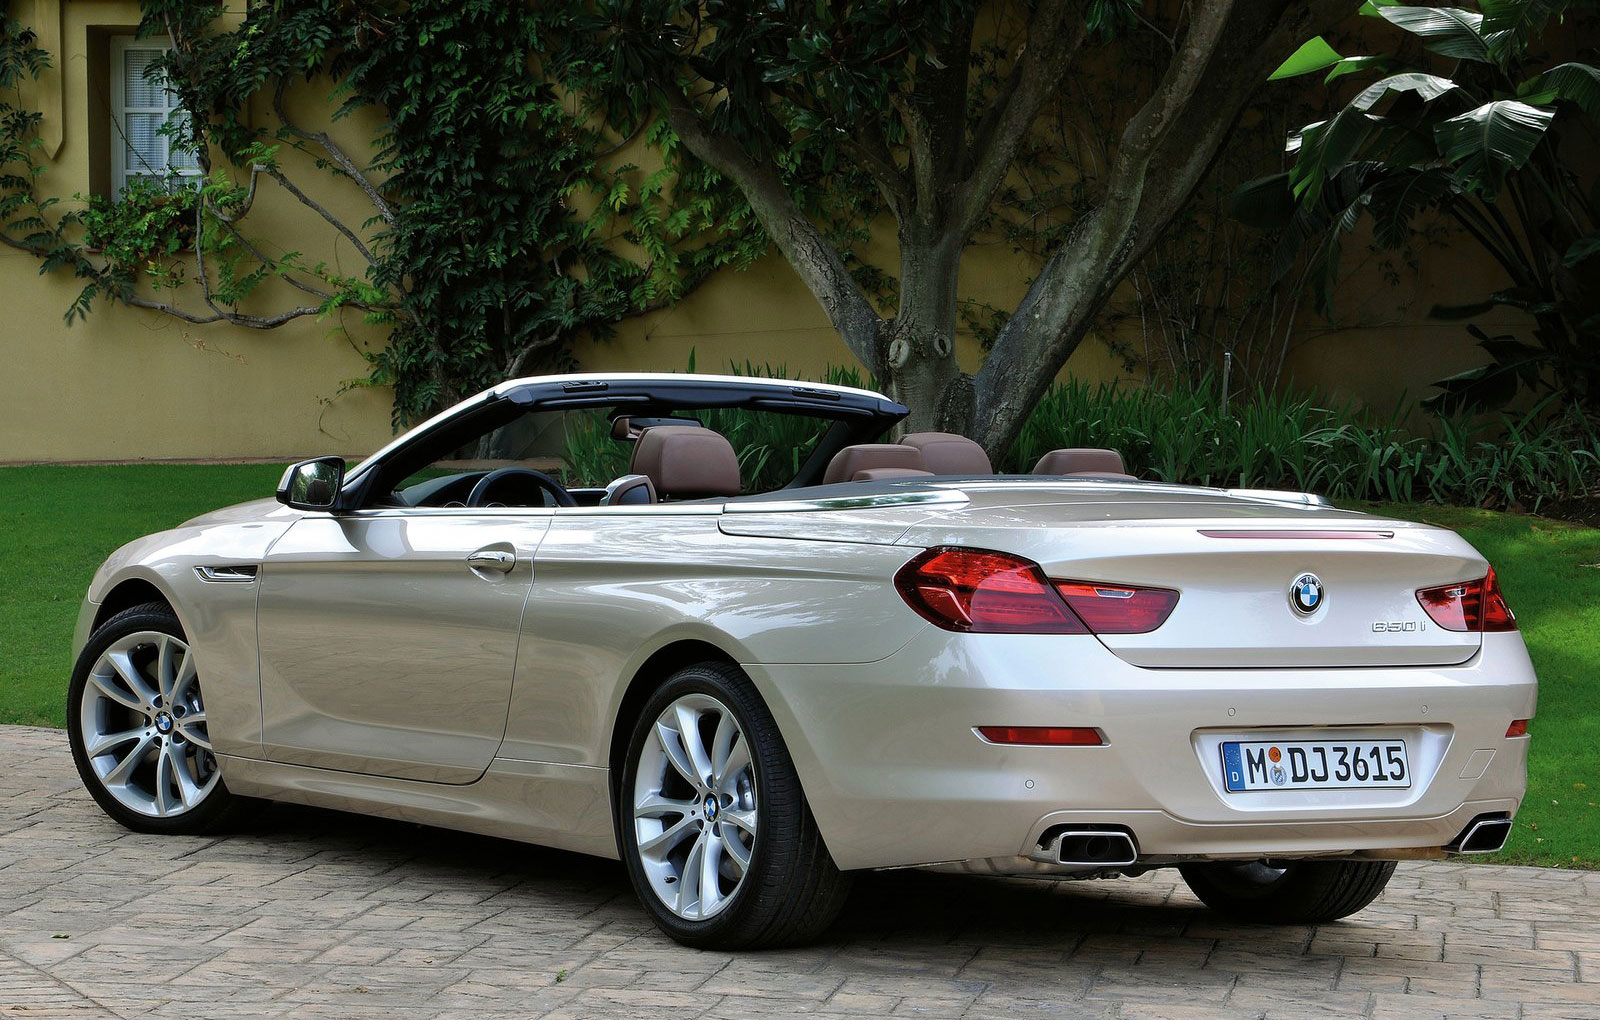 Sport Series 2012 bmw 6 series VIDEOs: 2012 BMW 6 Series Convertible (F13) fully revealed | BMWCoop